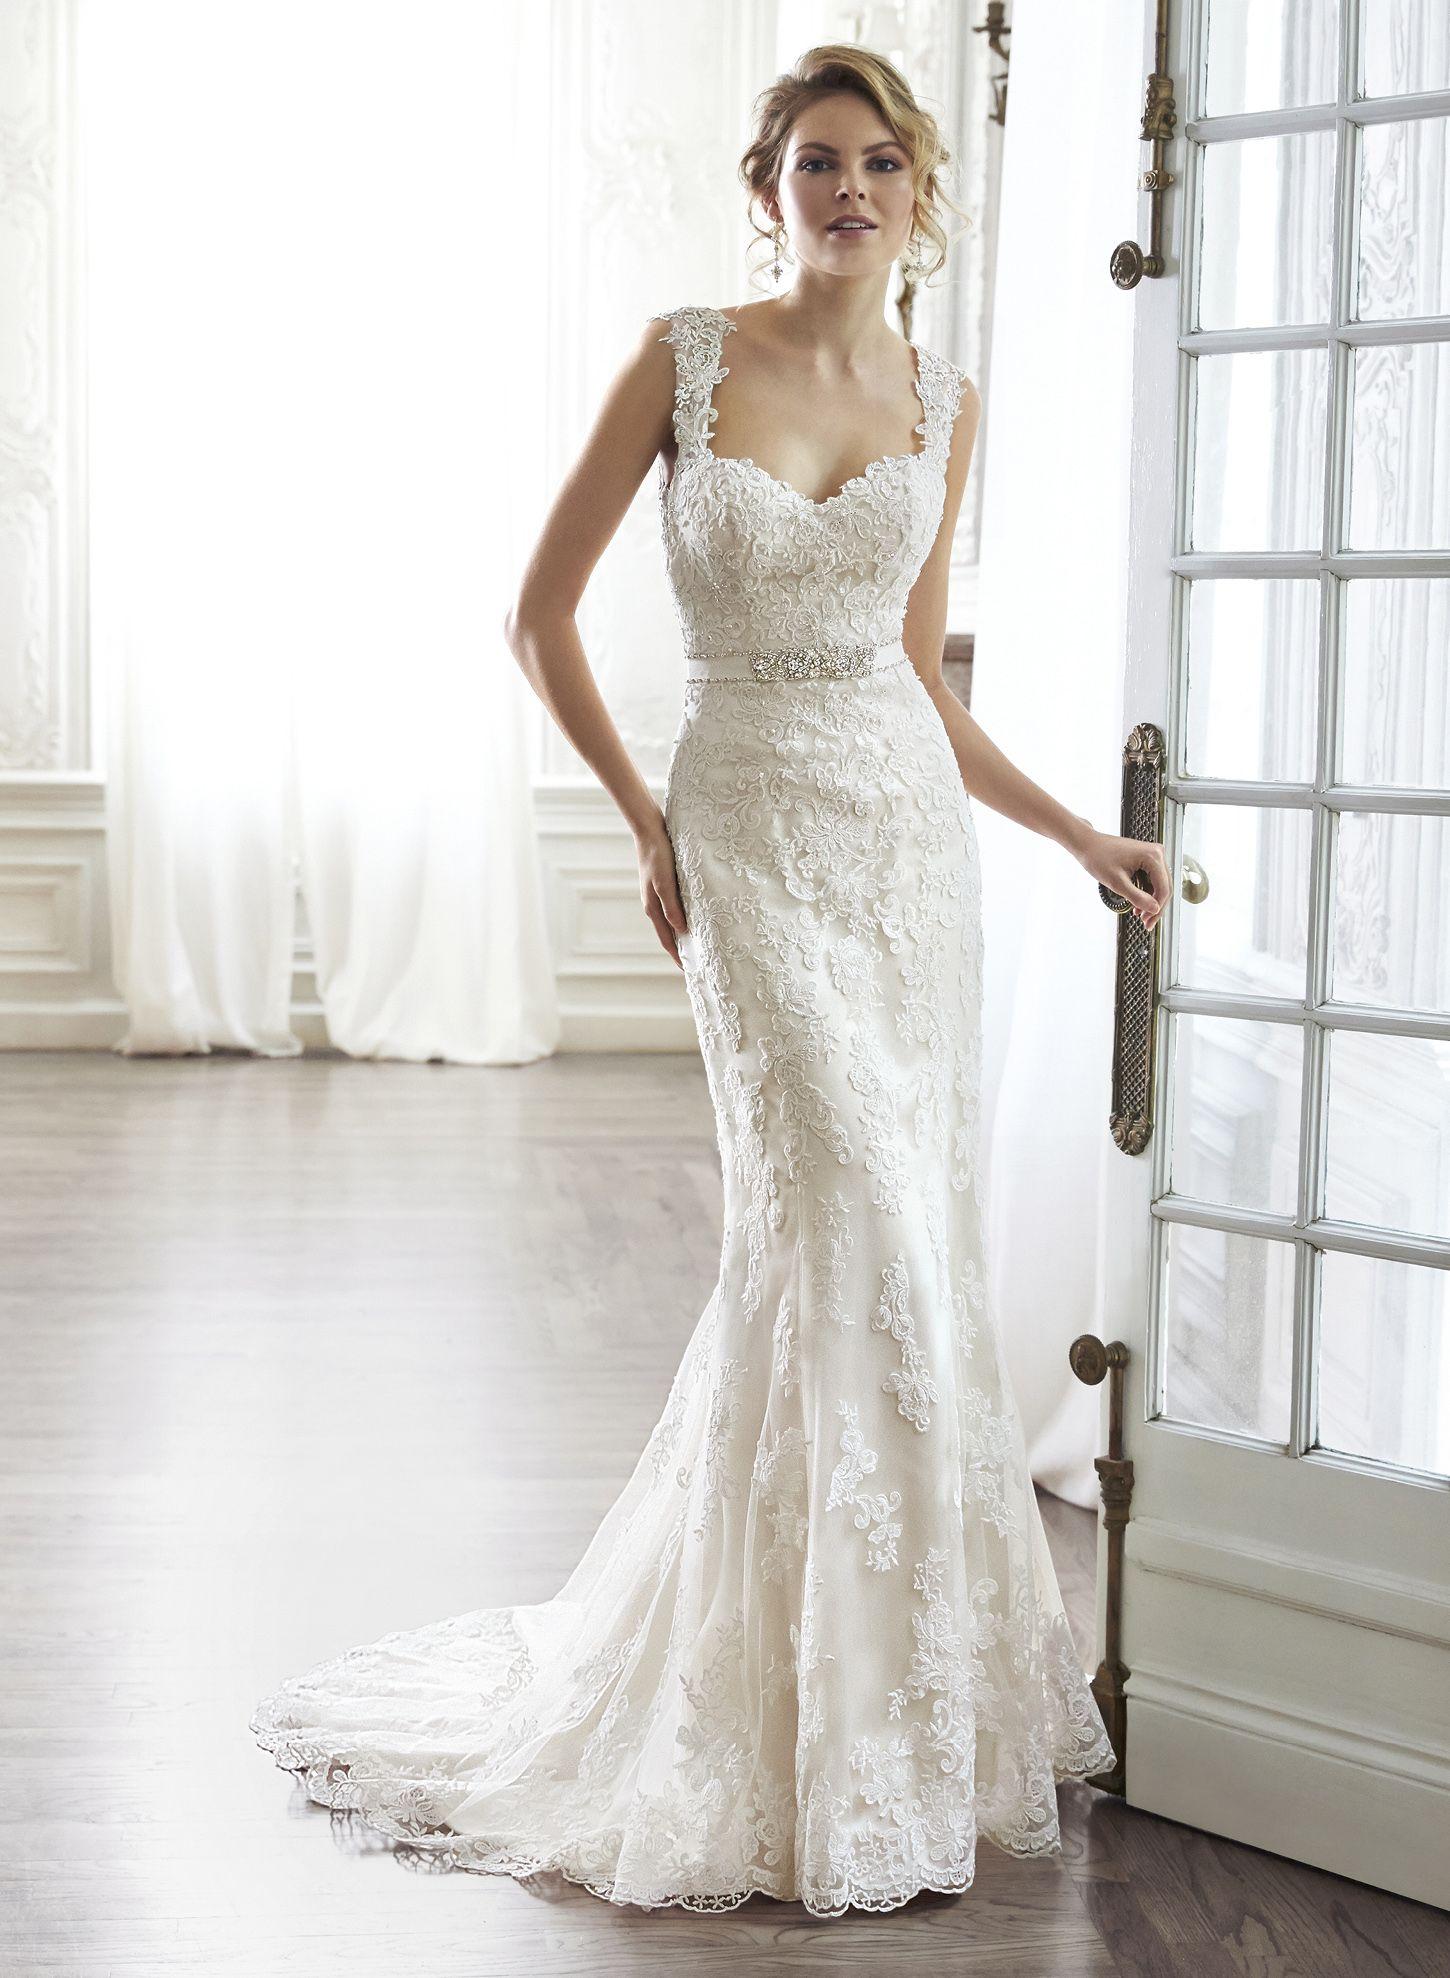 Lace strap wedding dress  Fashionable TrumpetMermaid Sweetheart FloorLength Bowknot Lace